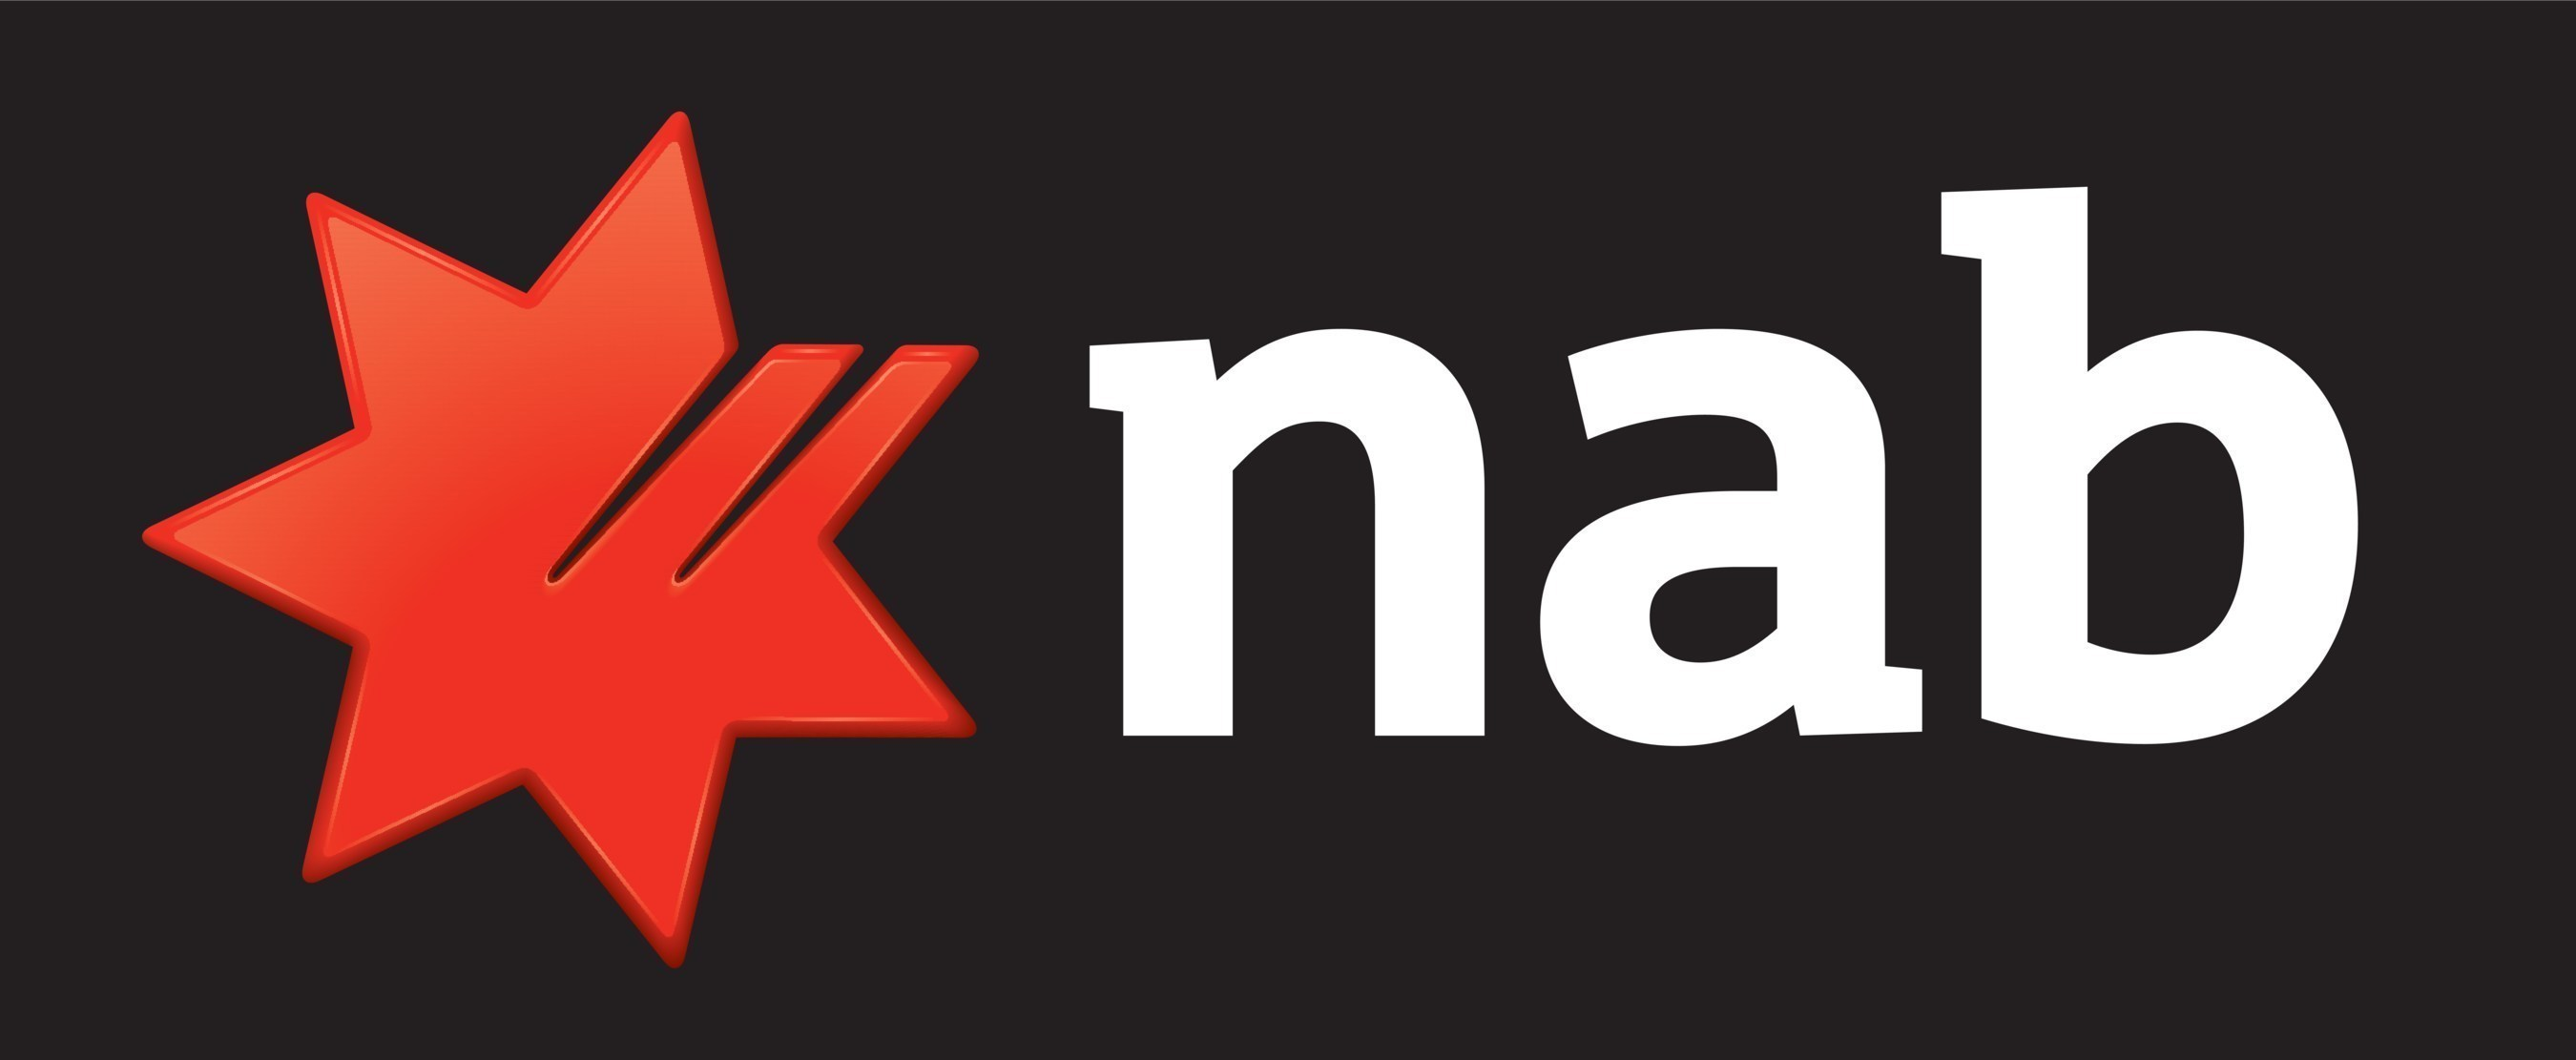 Live Nation And National Australia Bank Announce Major